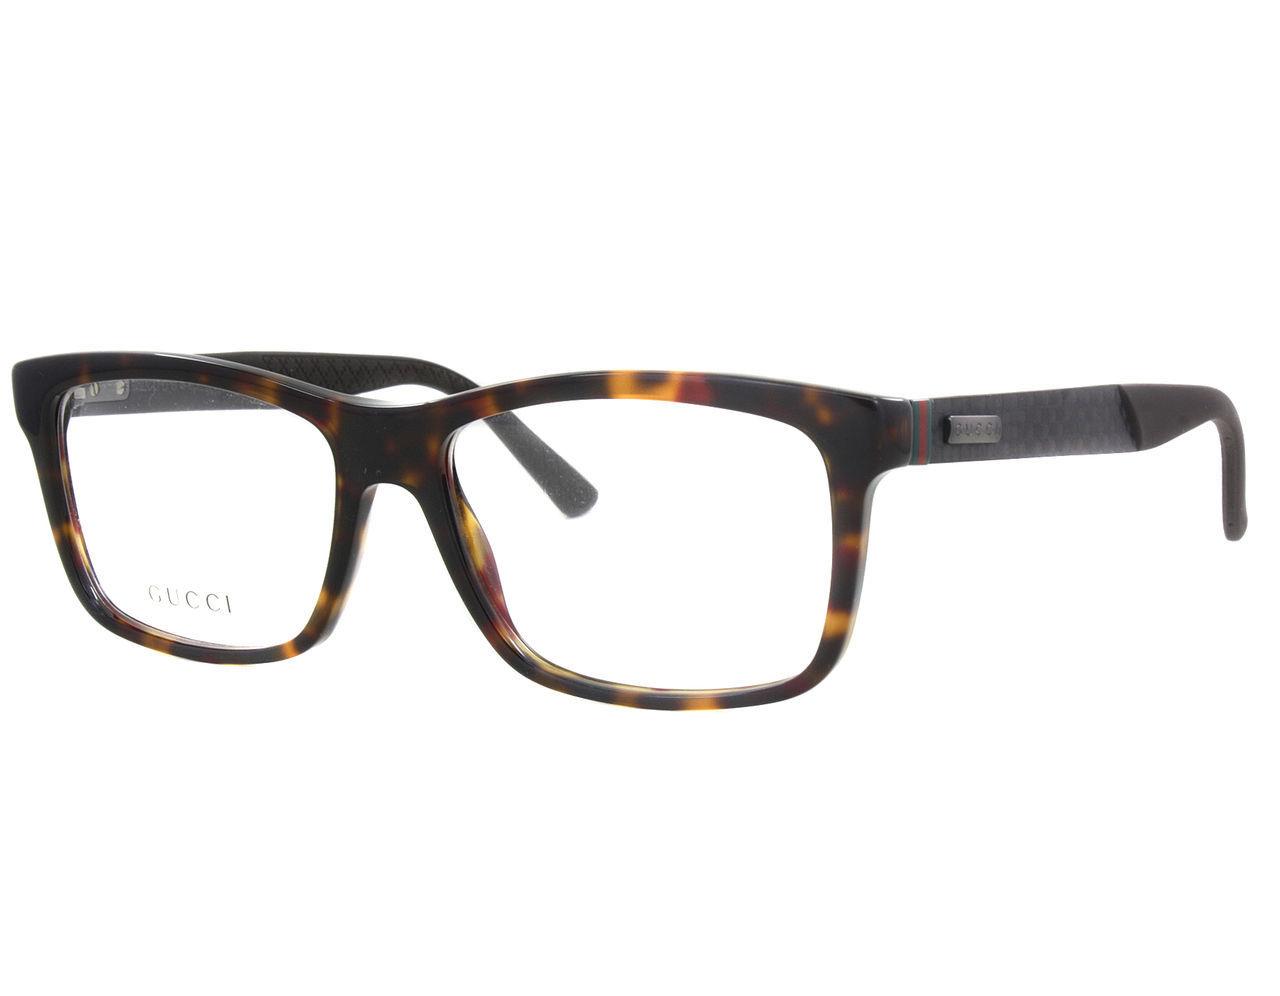 e486cdc916f0 Brand new Authentic Gucci GG1045/N 59W Havana eyeglasses frame 55-16-145mm  - $199.00